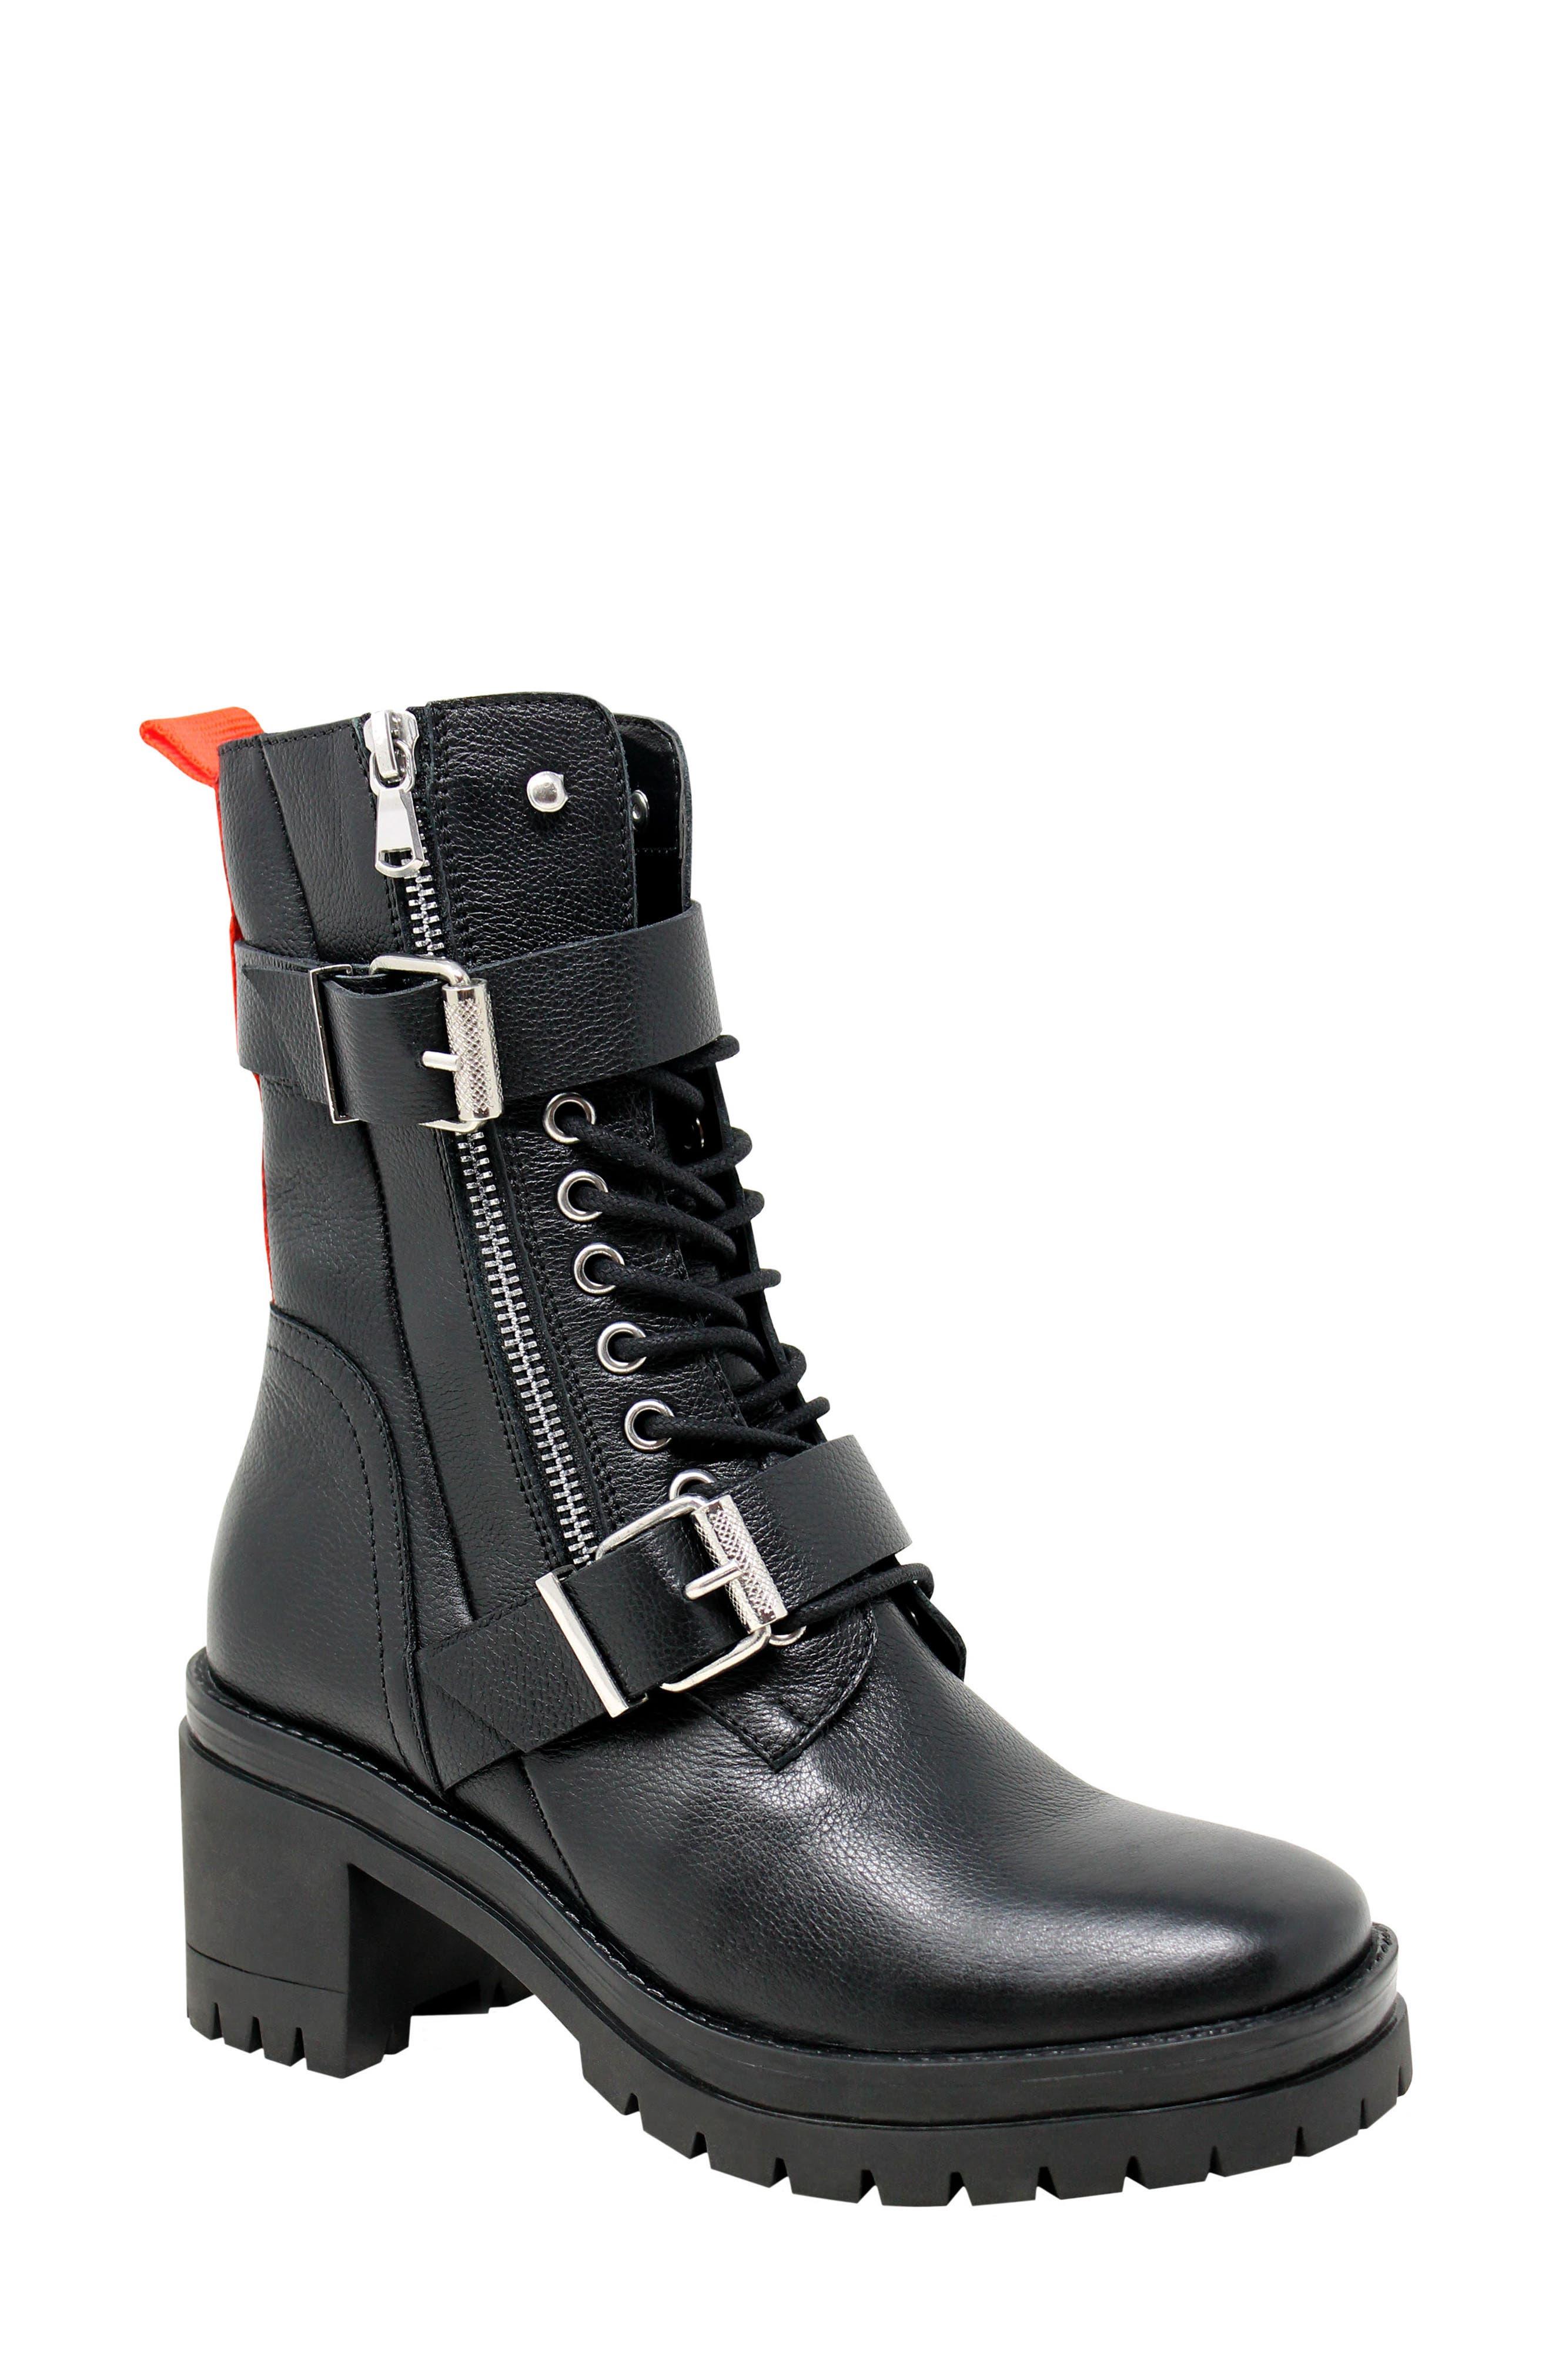 Clout Combat Boot